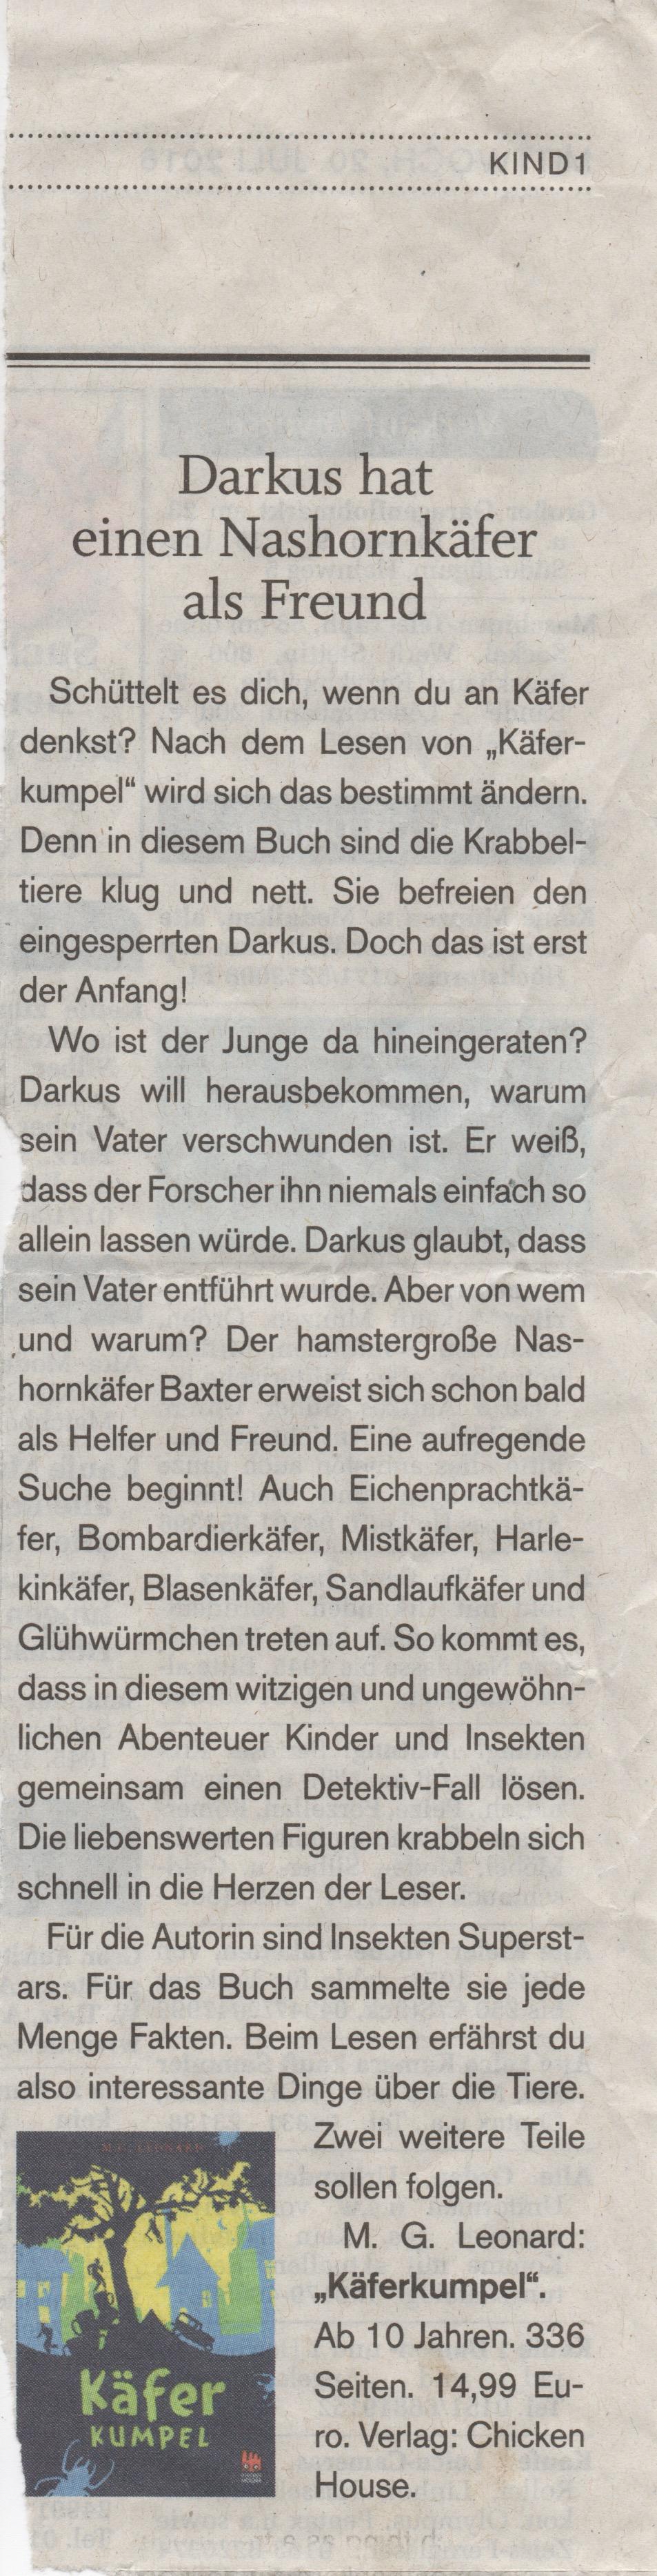 GermanreviewsBB1.jpeg